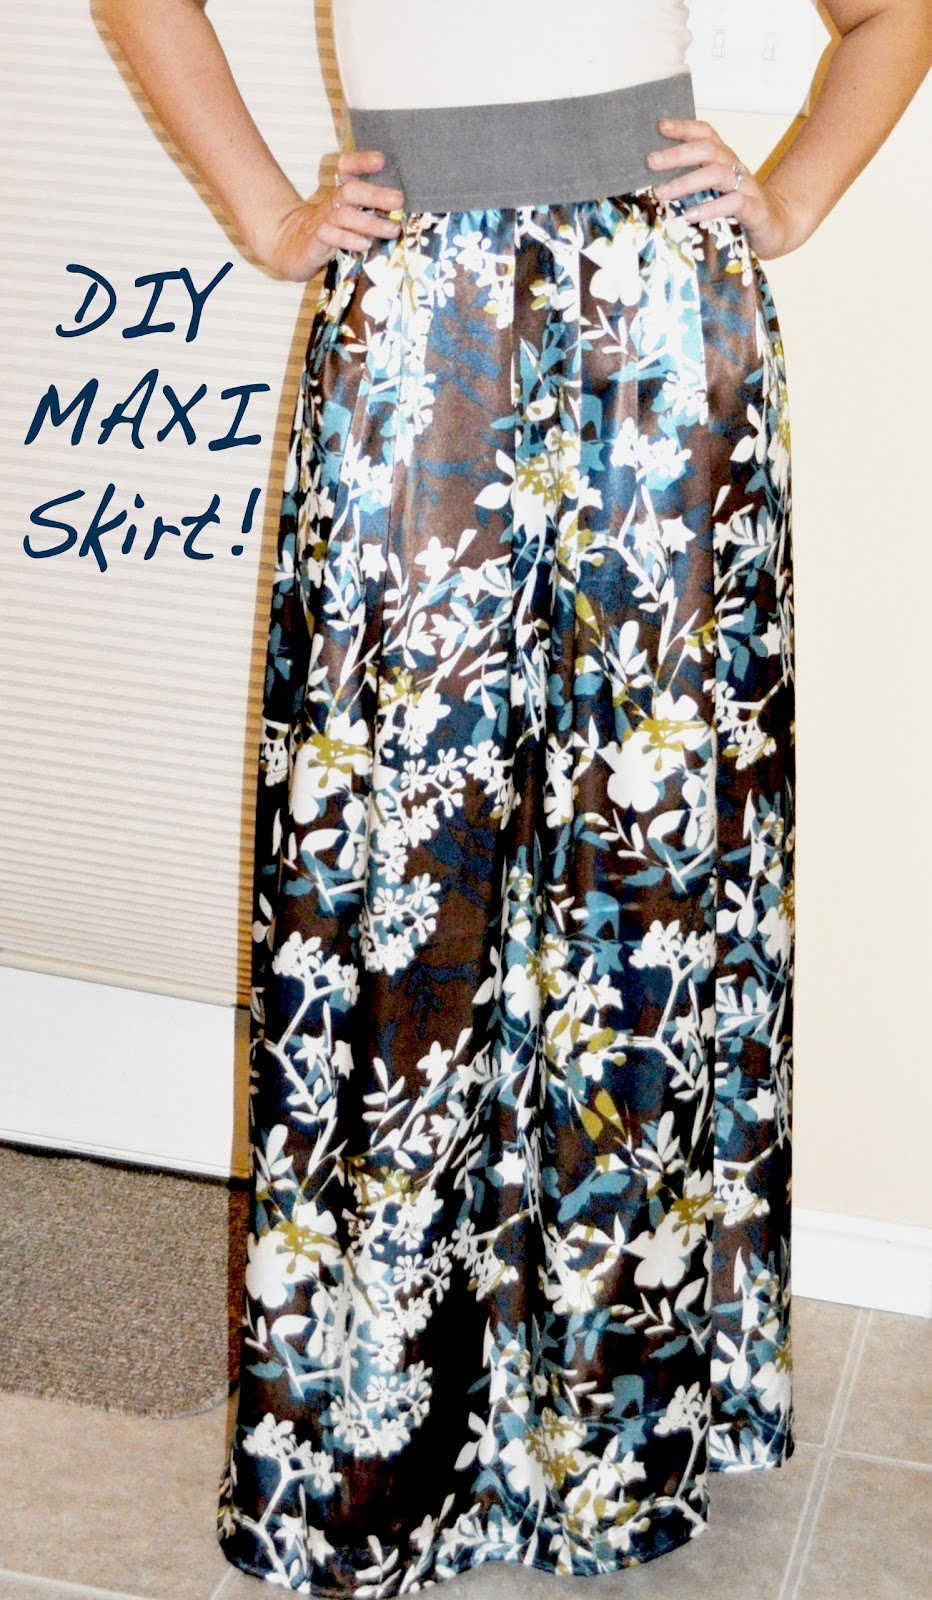 maxi skirt sewing